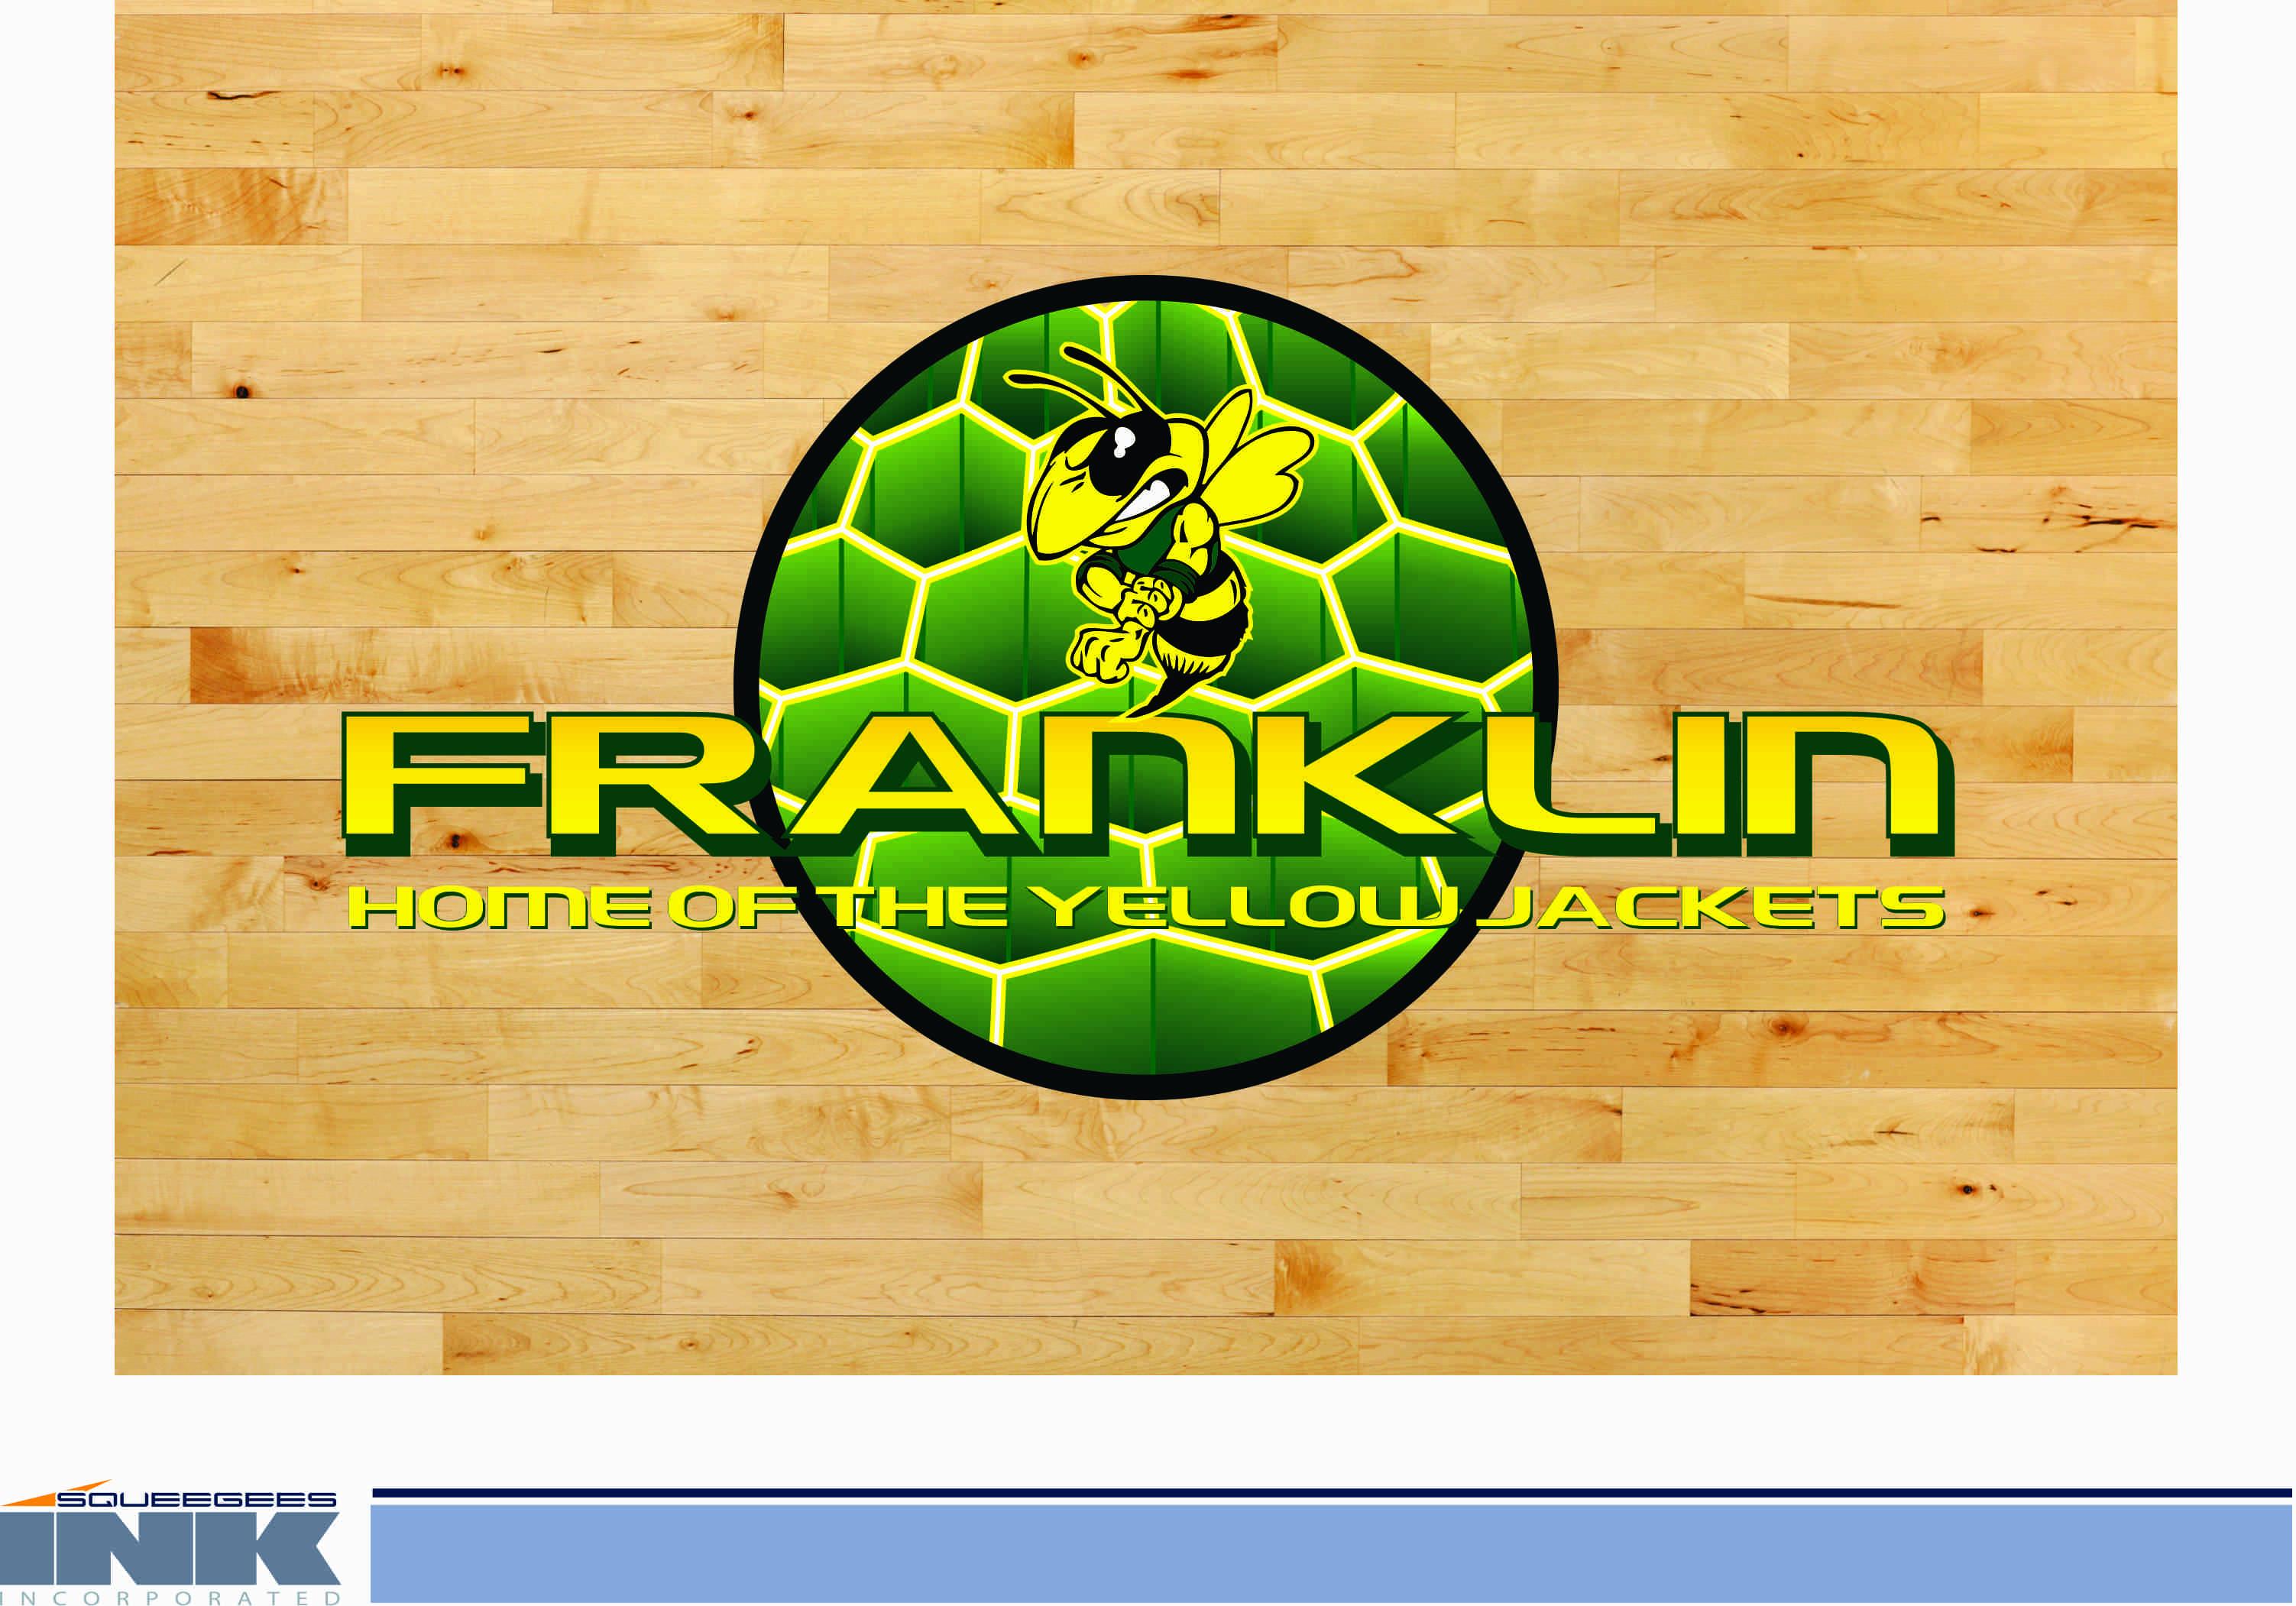 Franklin High Homepage